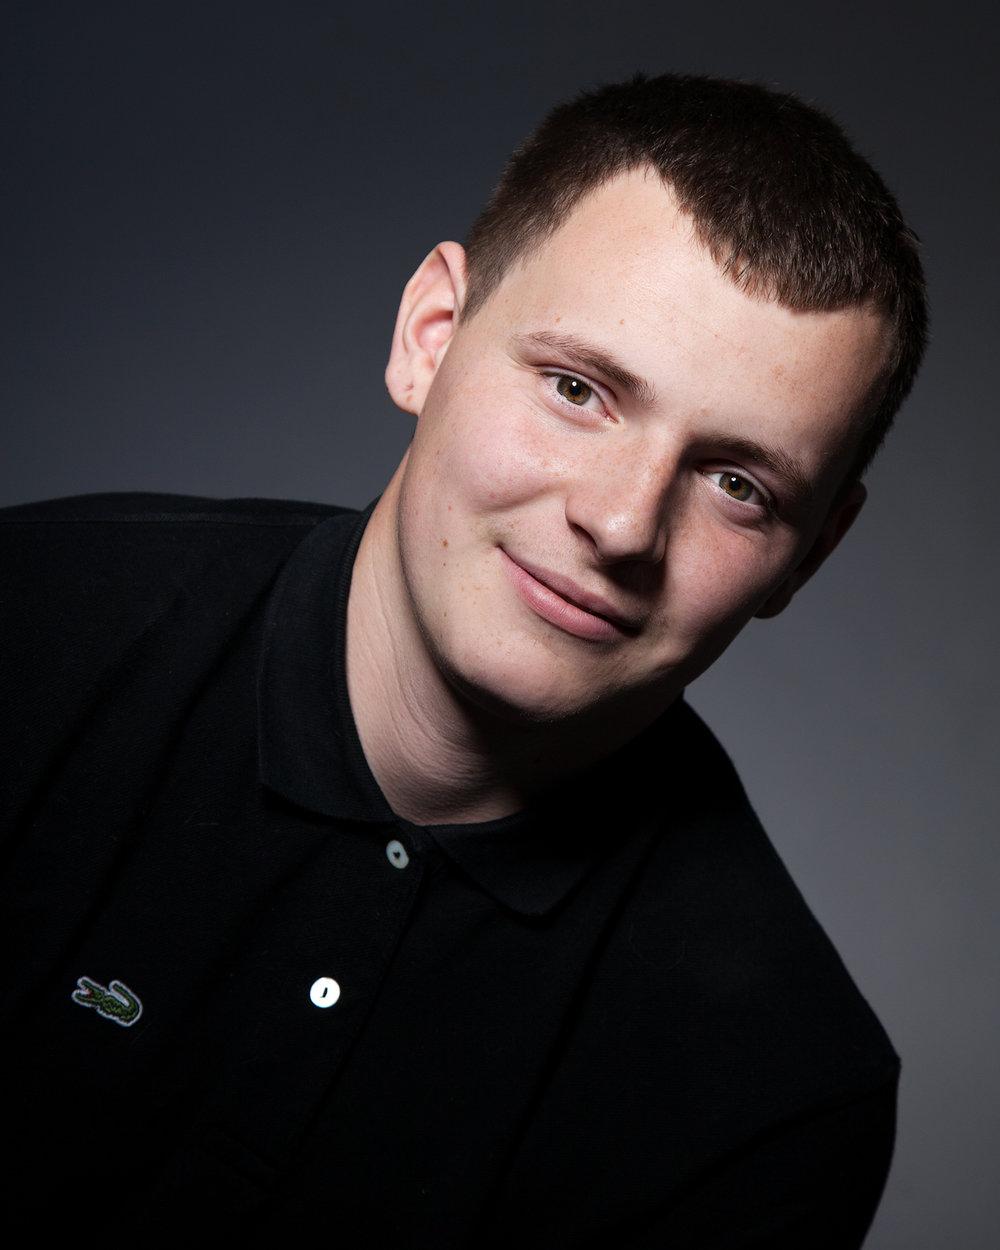 Teen_Portrait_Photographer_Newbury_Berkshire_015.jpg